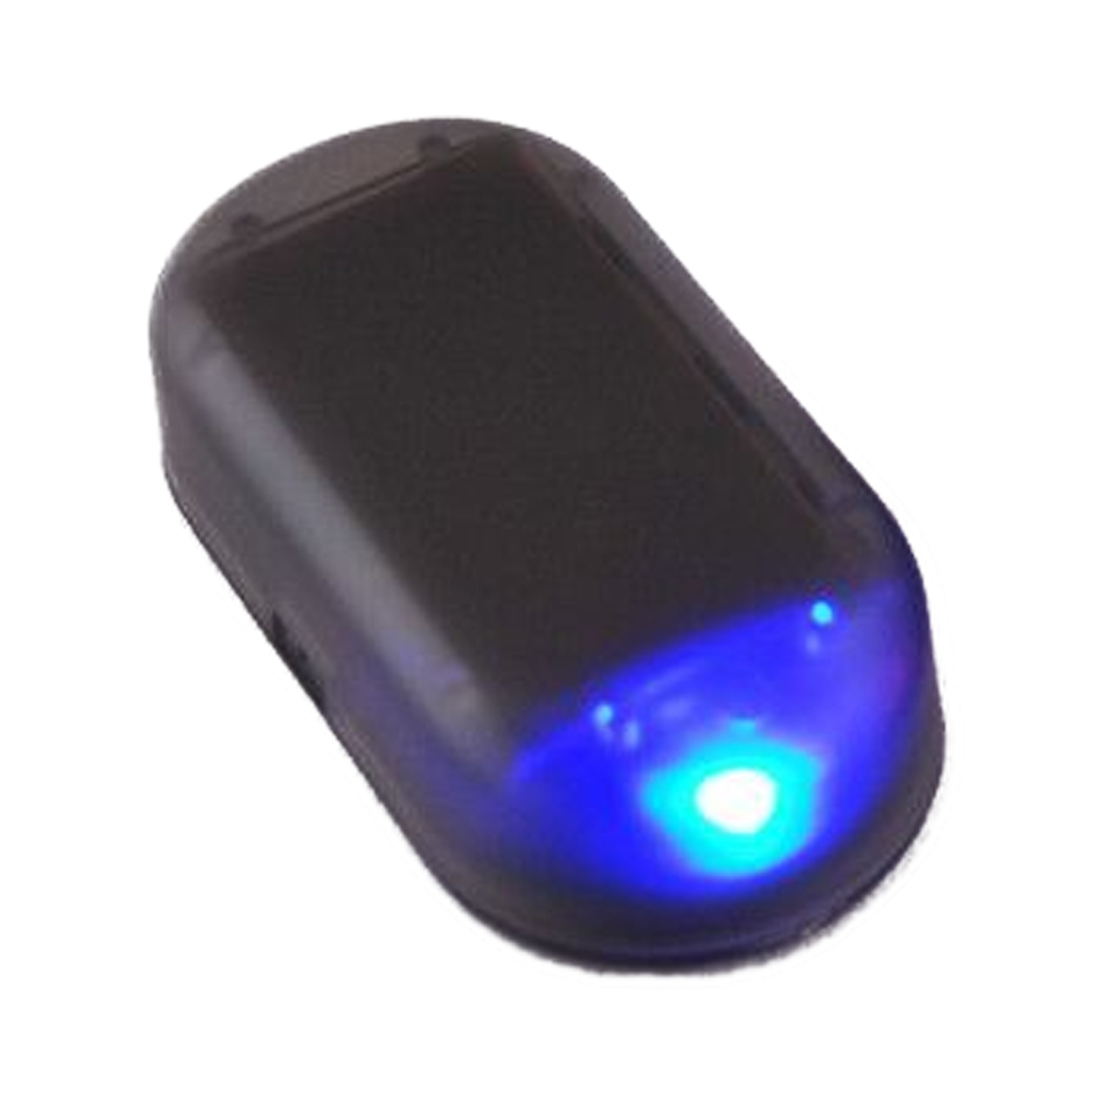 1PC Universal Car Led Light Security System Warning Theft Flash Blinking Fake Solar Car Alarm LED Light New Trendy Floor Price